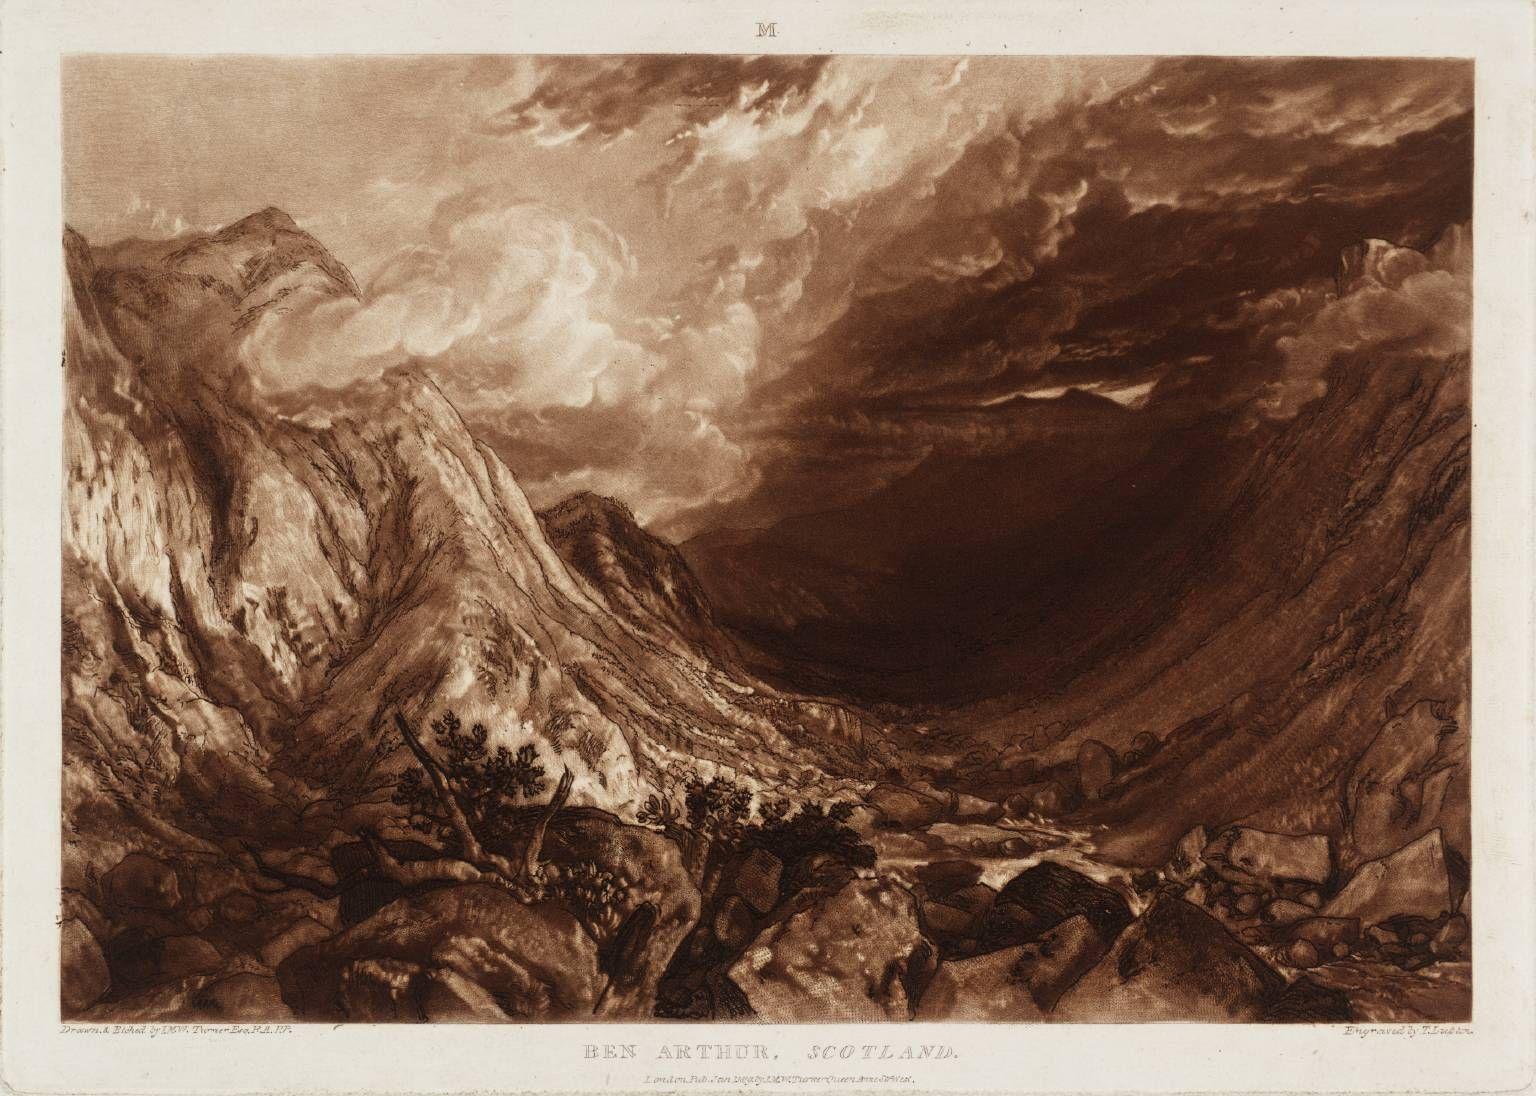 LIBER STUDIORUM. PART 14 ( 01 / 01 / 1819 ). PLATE 69. BEN ARTHUR, SCOTLAND. Etcher : J.M.W. Turner. Engraver : Thomas Lupton.